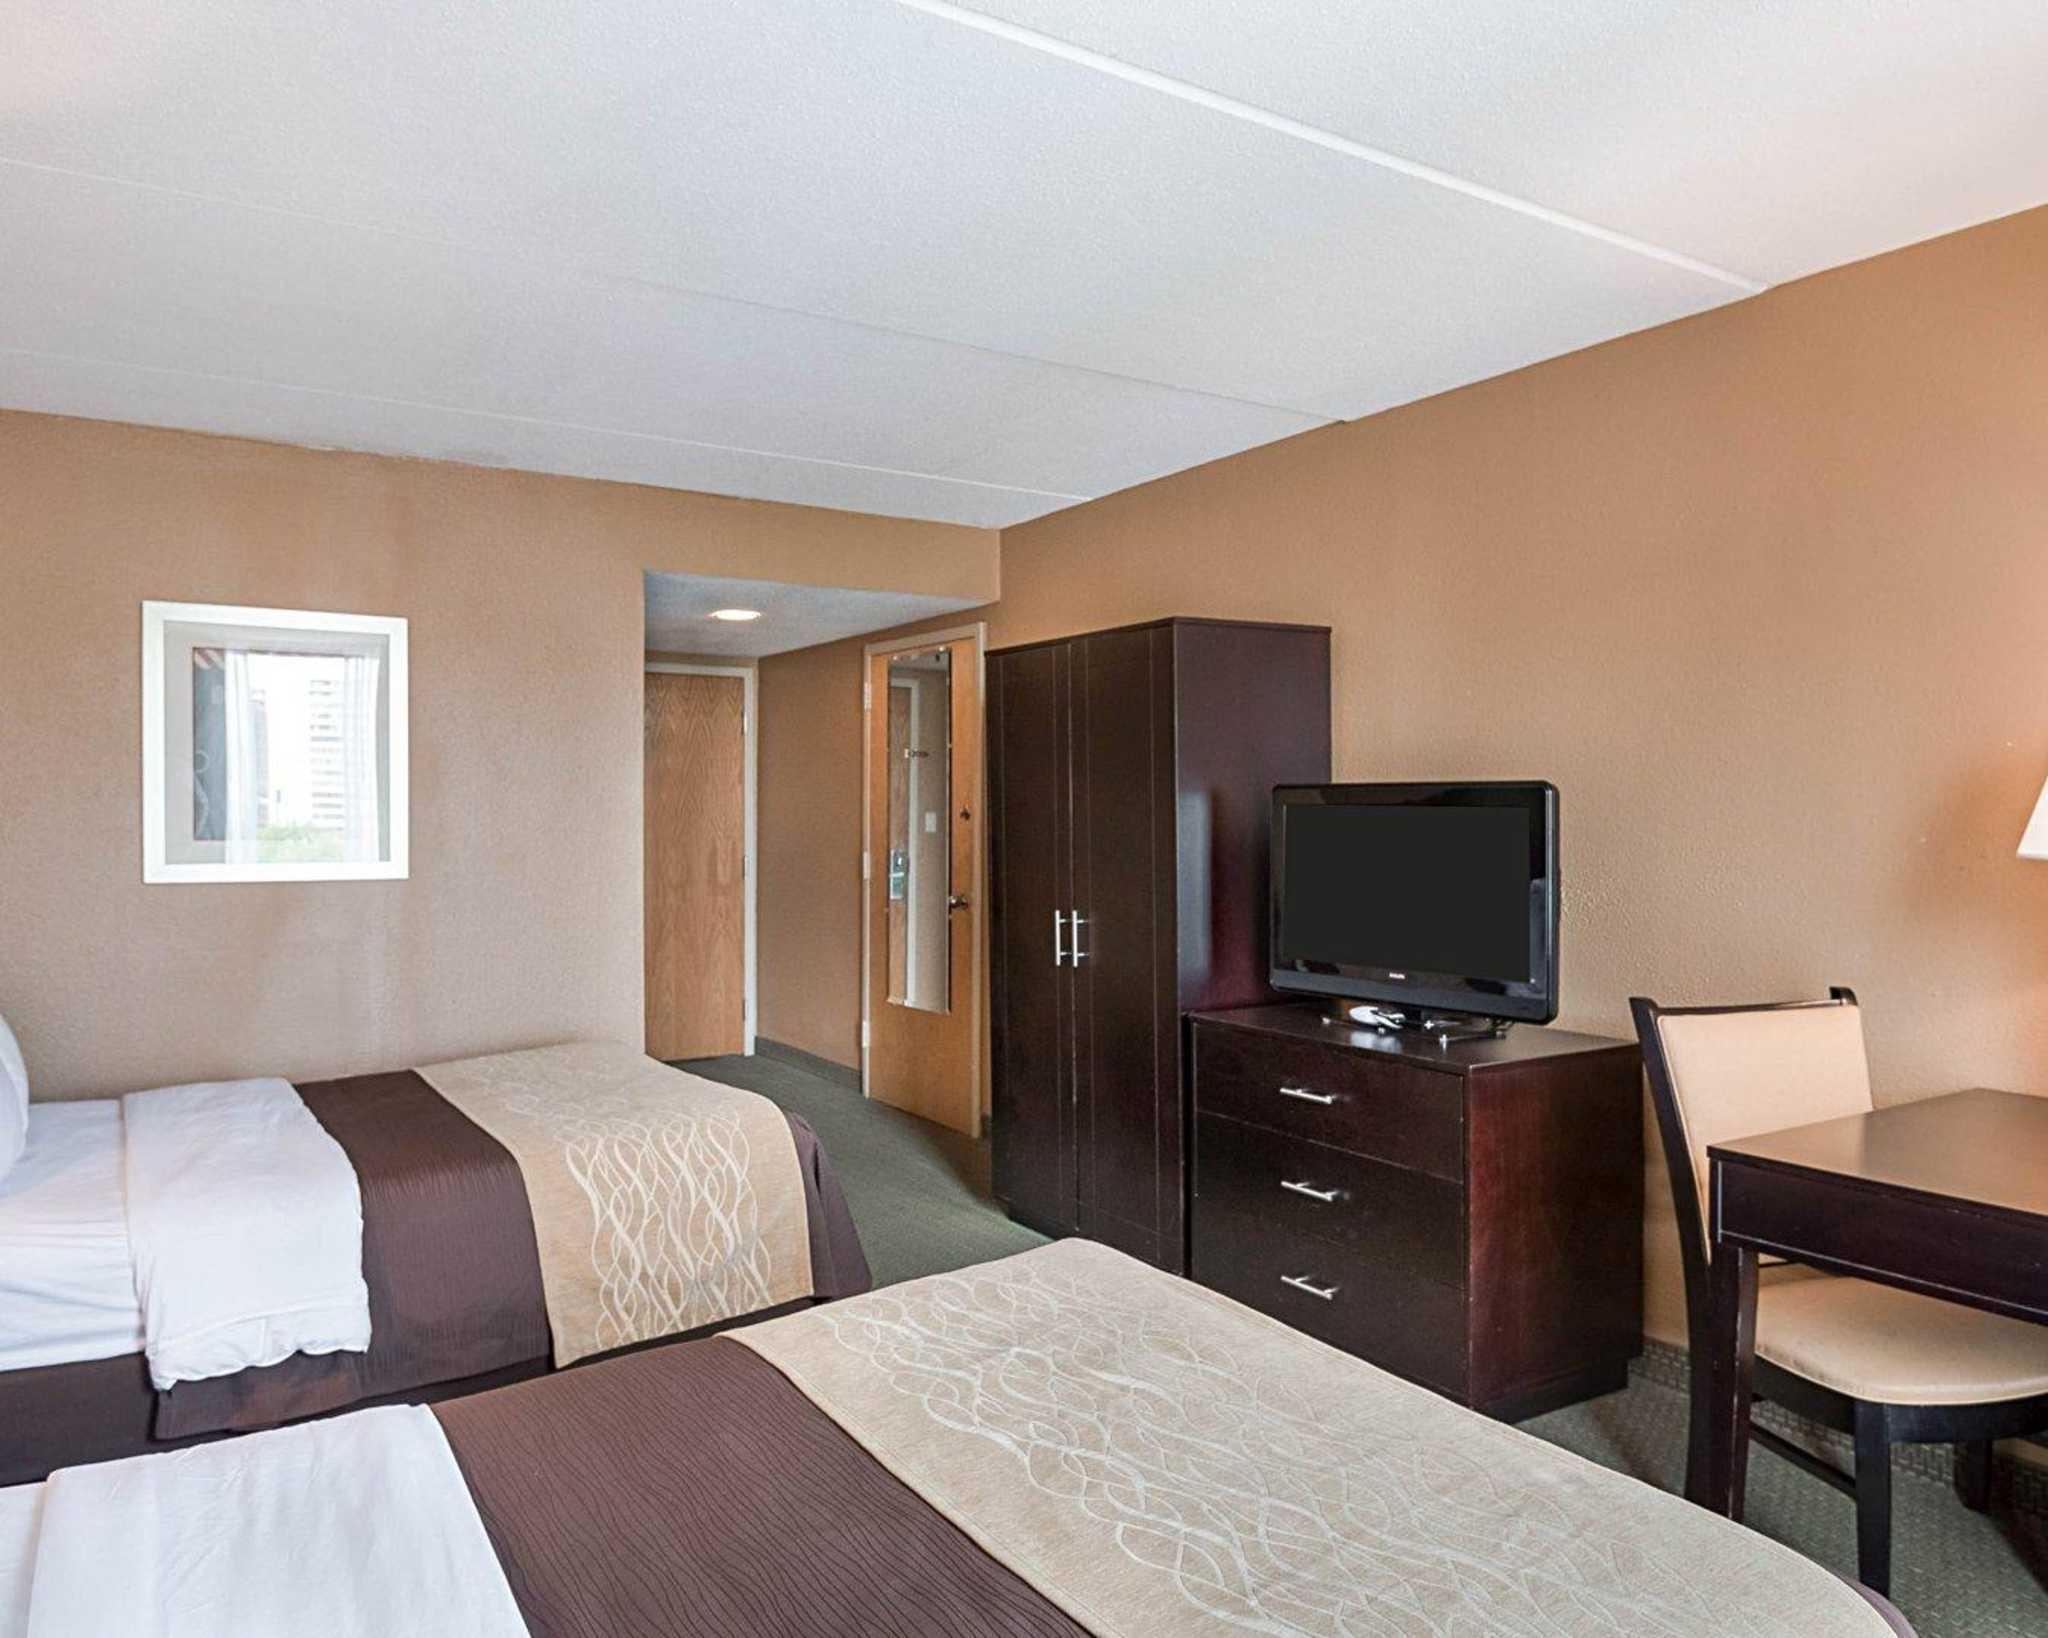 Comfort Inn Gold Coast image 13